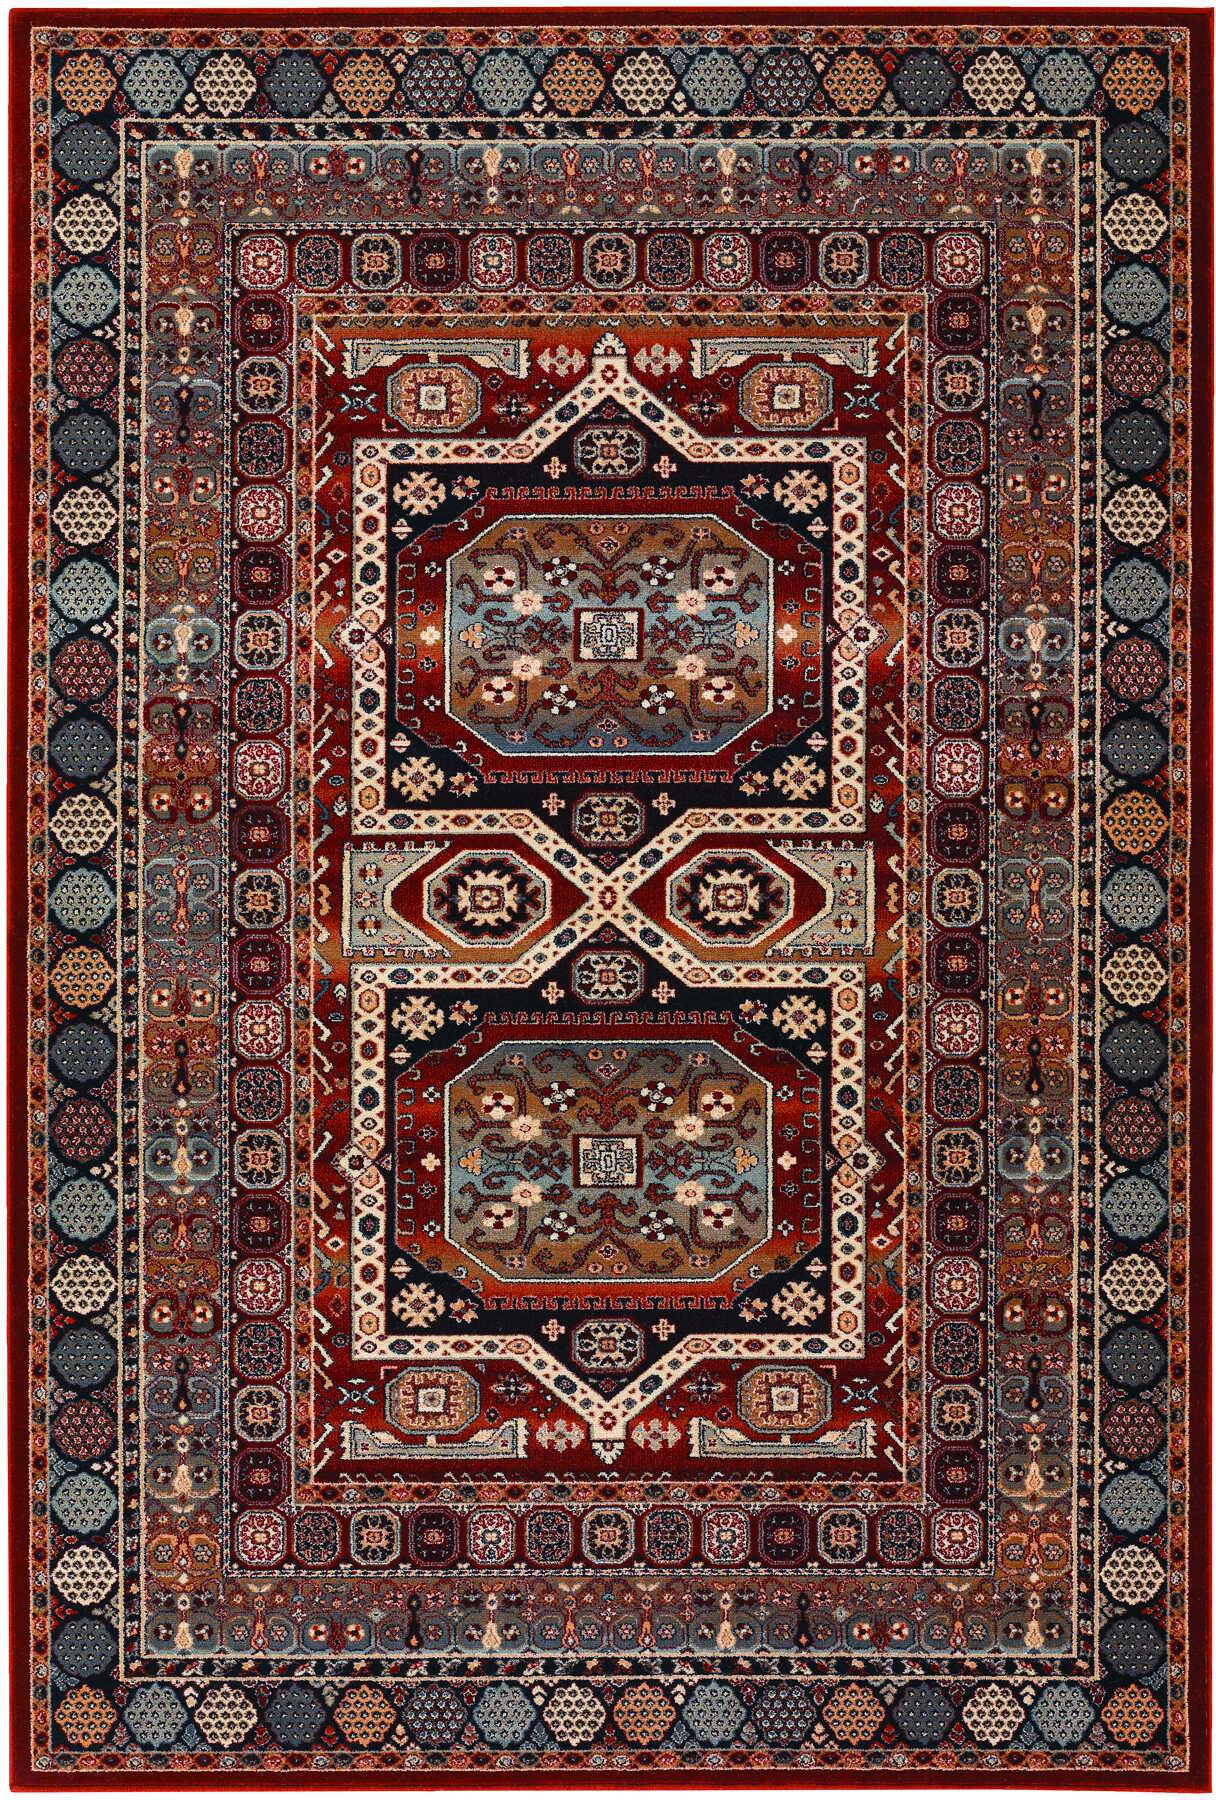 Couristan Timeless Treasures Maharaja Area Rug Burgundy Rugs Area Rugs Persian Area Rugs